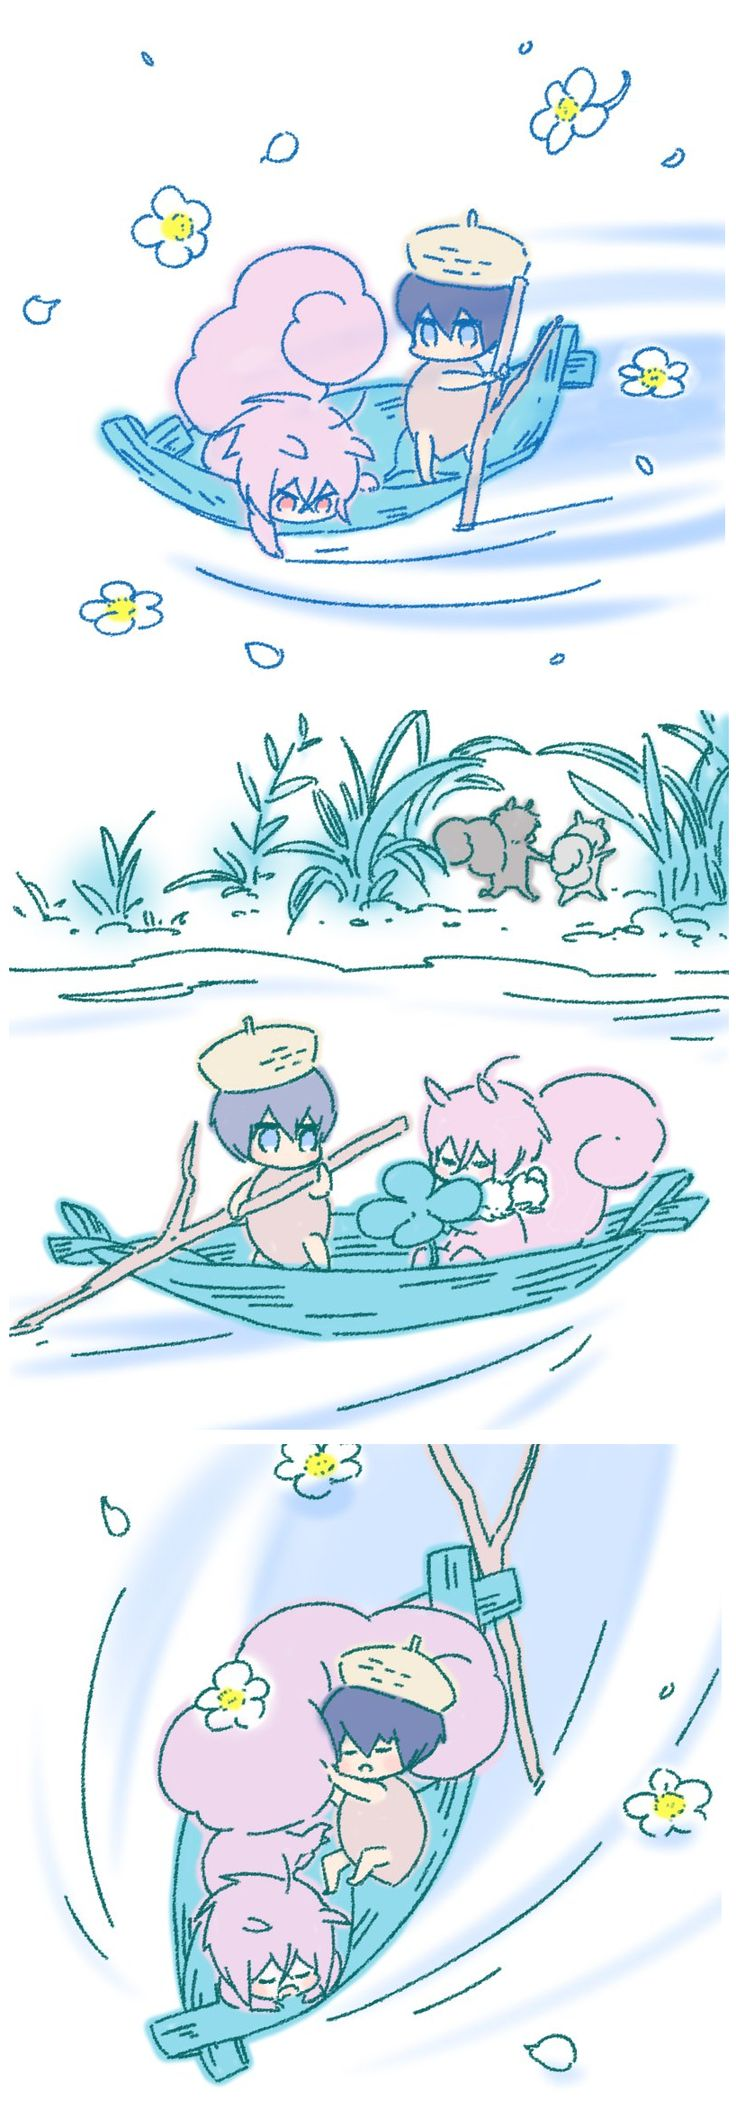 Acorn Haru and squirrel Rin enjoy a lovely day together, unaware of Sousuke's adventure ...  Drawn by hemu_HR ... Free! - Iwatobi Swim Club, haruka nanase, haru nanase, haru, haruka, free!, iwatobi, nanase, matsuoka, rin, rin matsuoka, acorn, squirrel, sousuke, sousuke yamazaki, yamazaki, nitori, aiichiro nitori, aiichiro